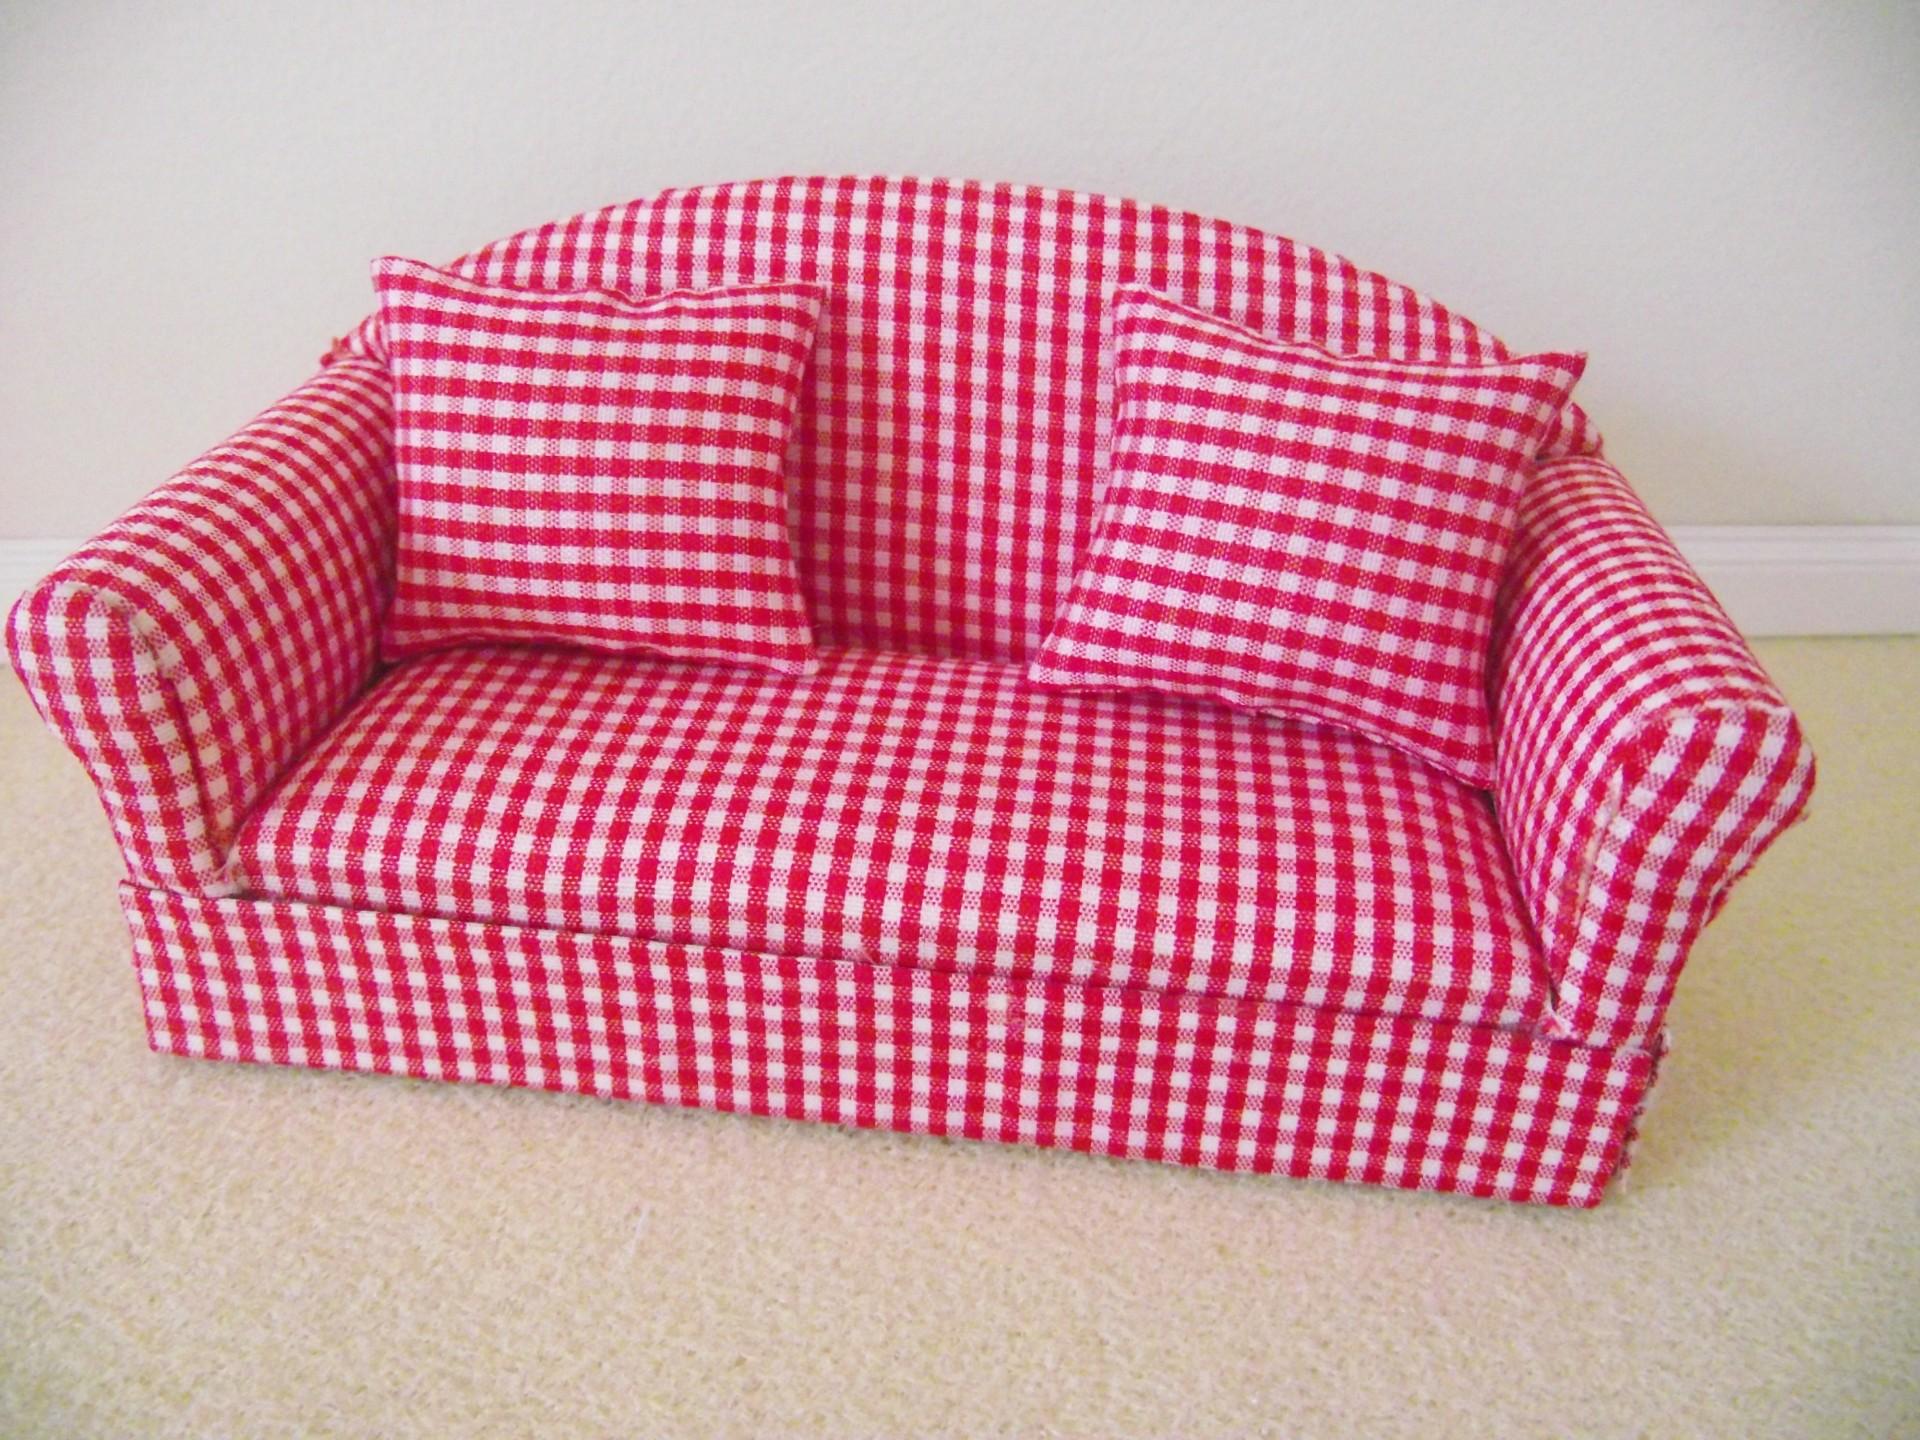 Gingham Sofa. Blue Gingham Settees And Gingham On Pinterest. Sofa ...